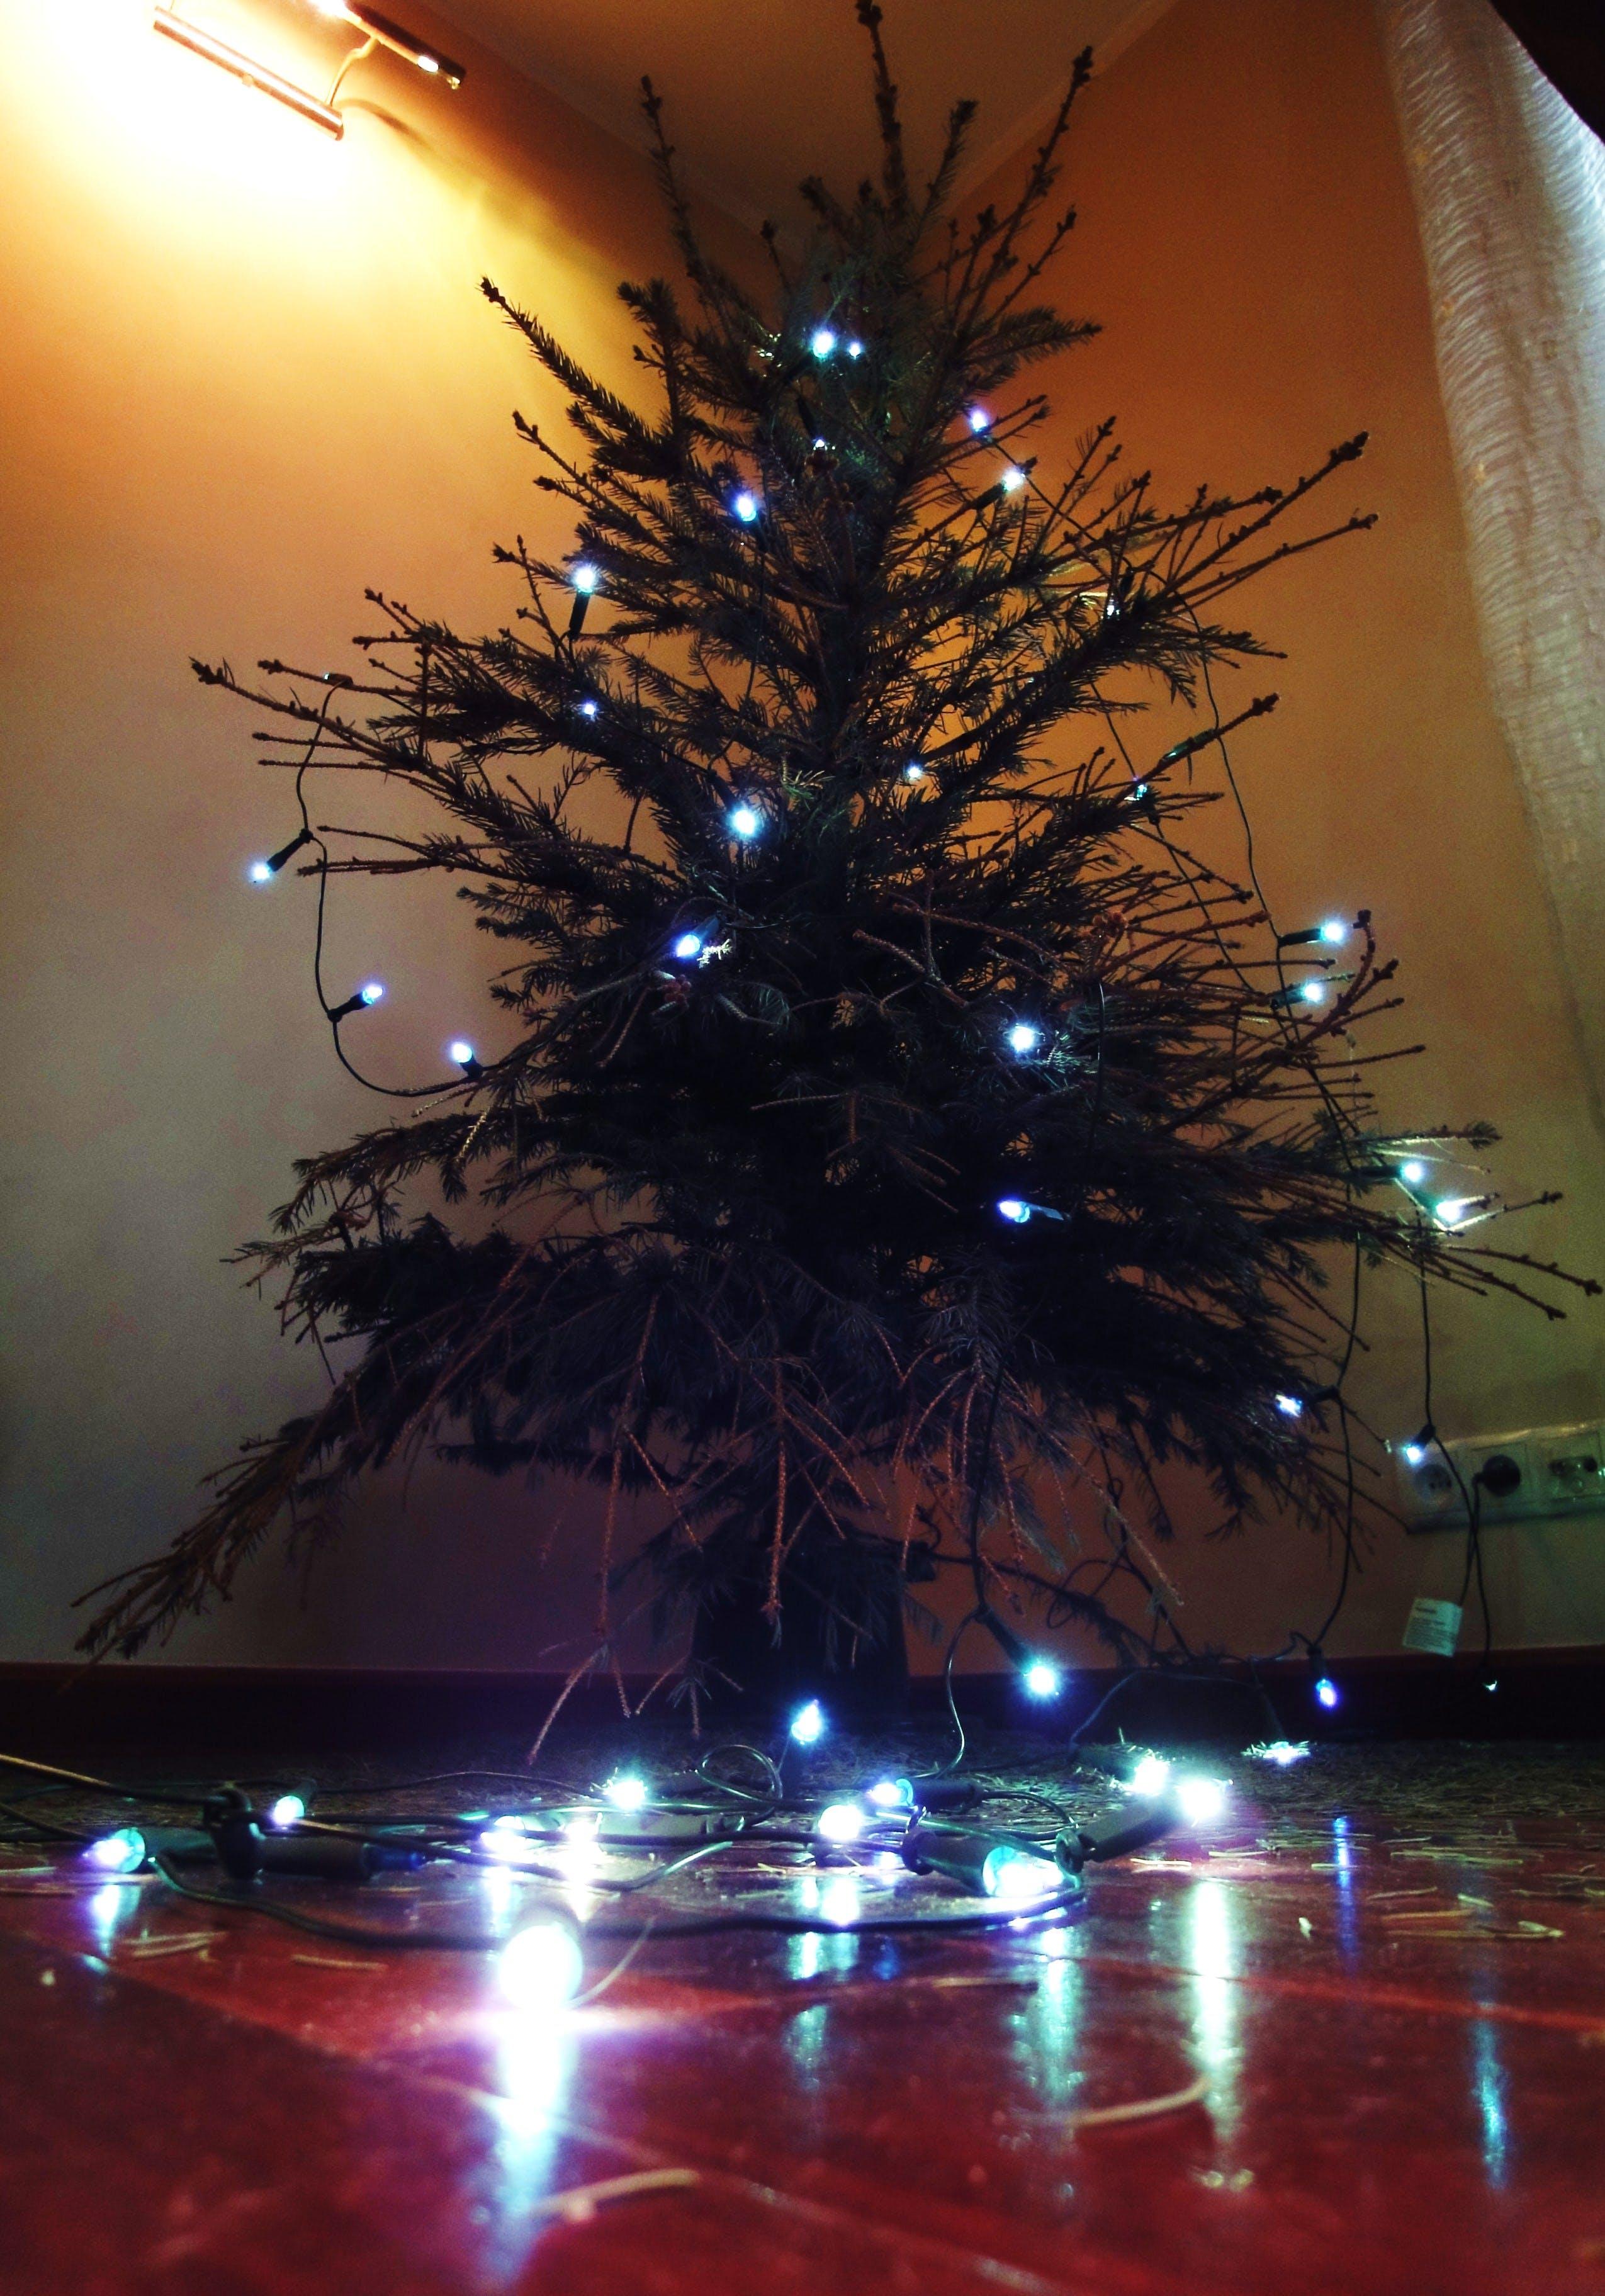 Free stock photo of lights, needle, christmas tree